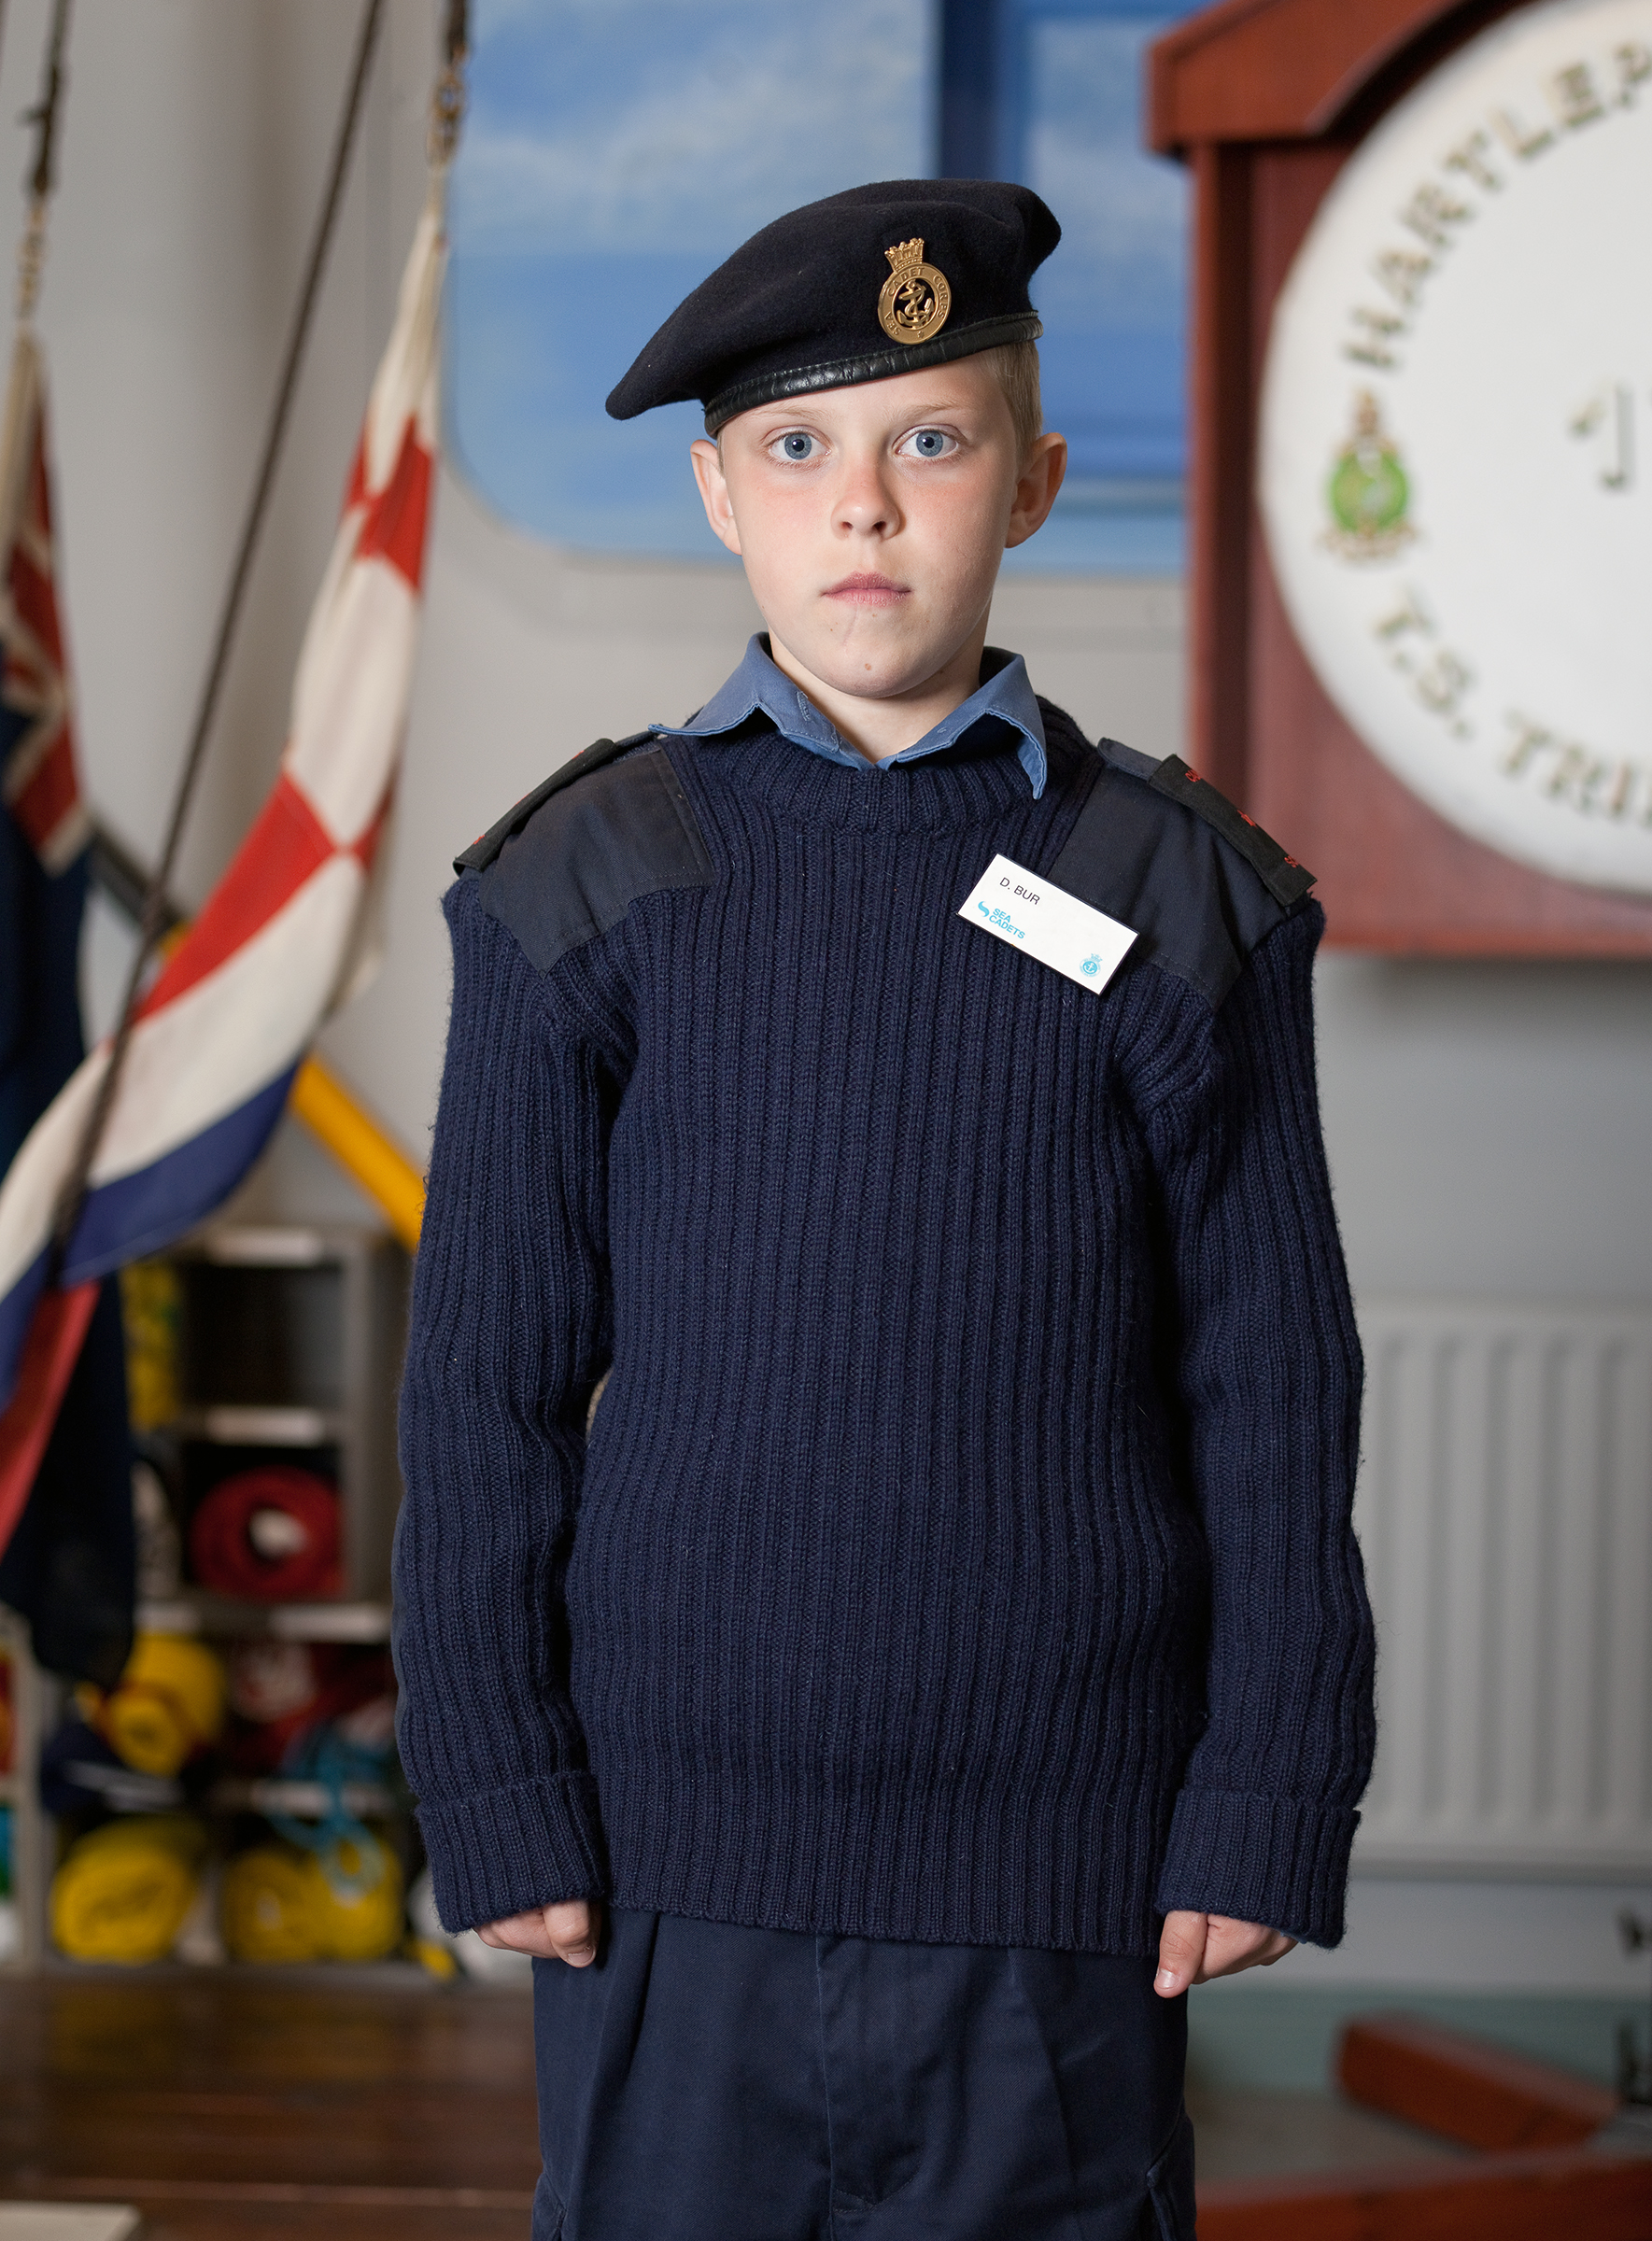 594381. Sea Cadet